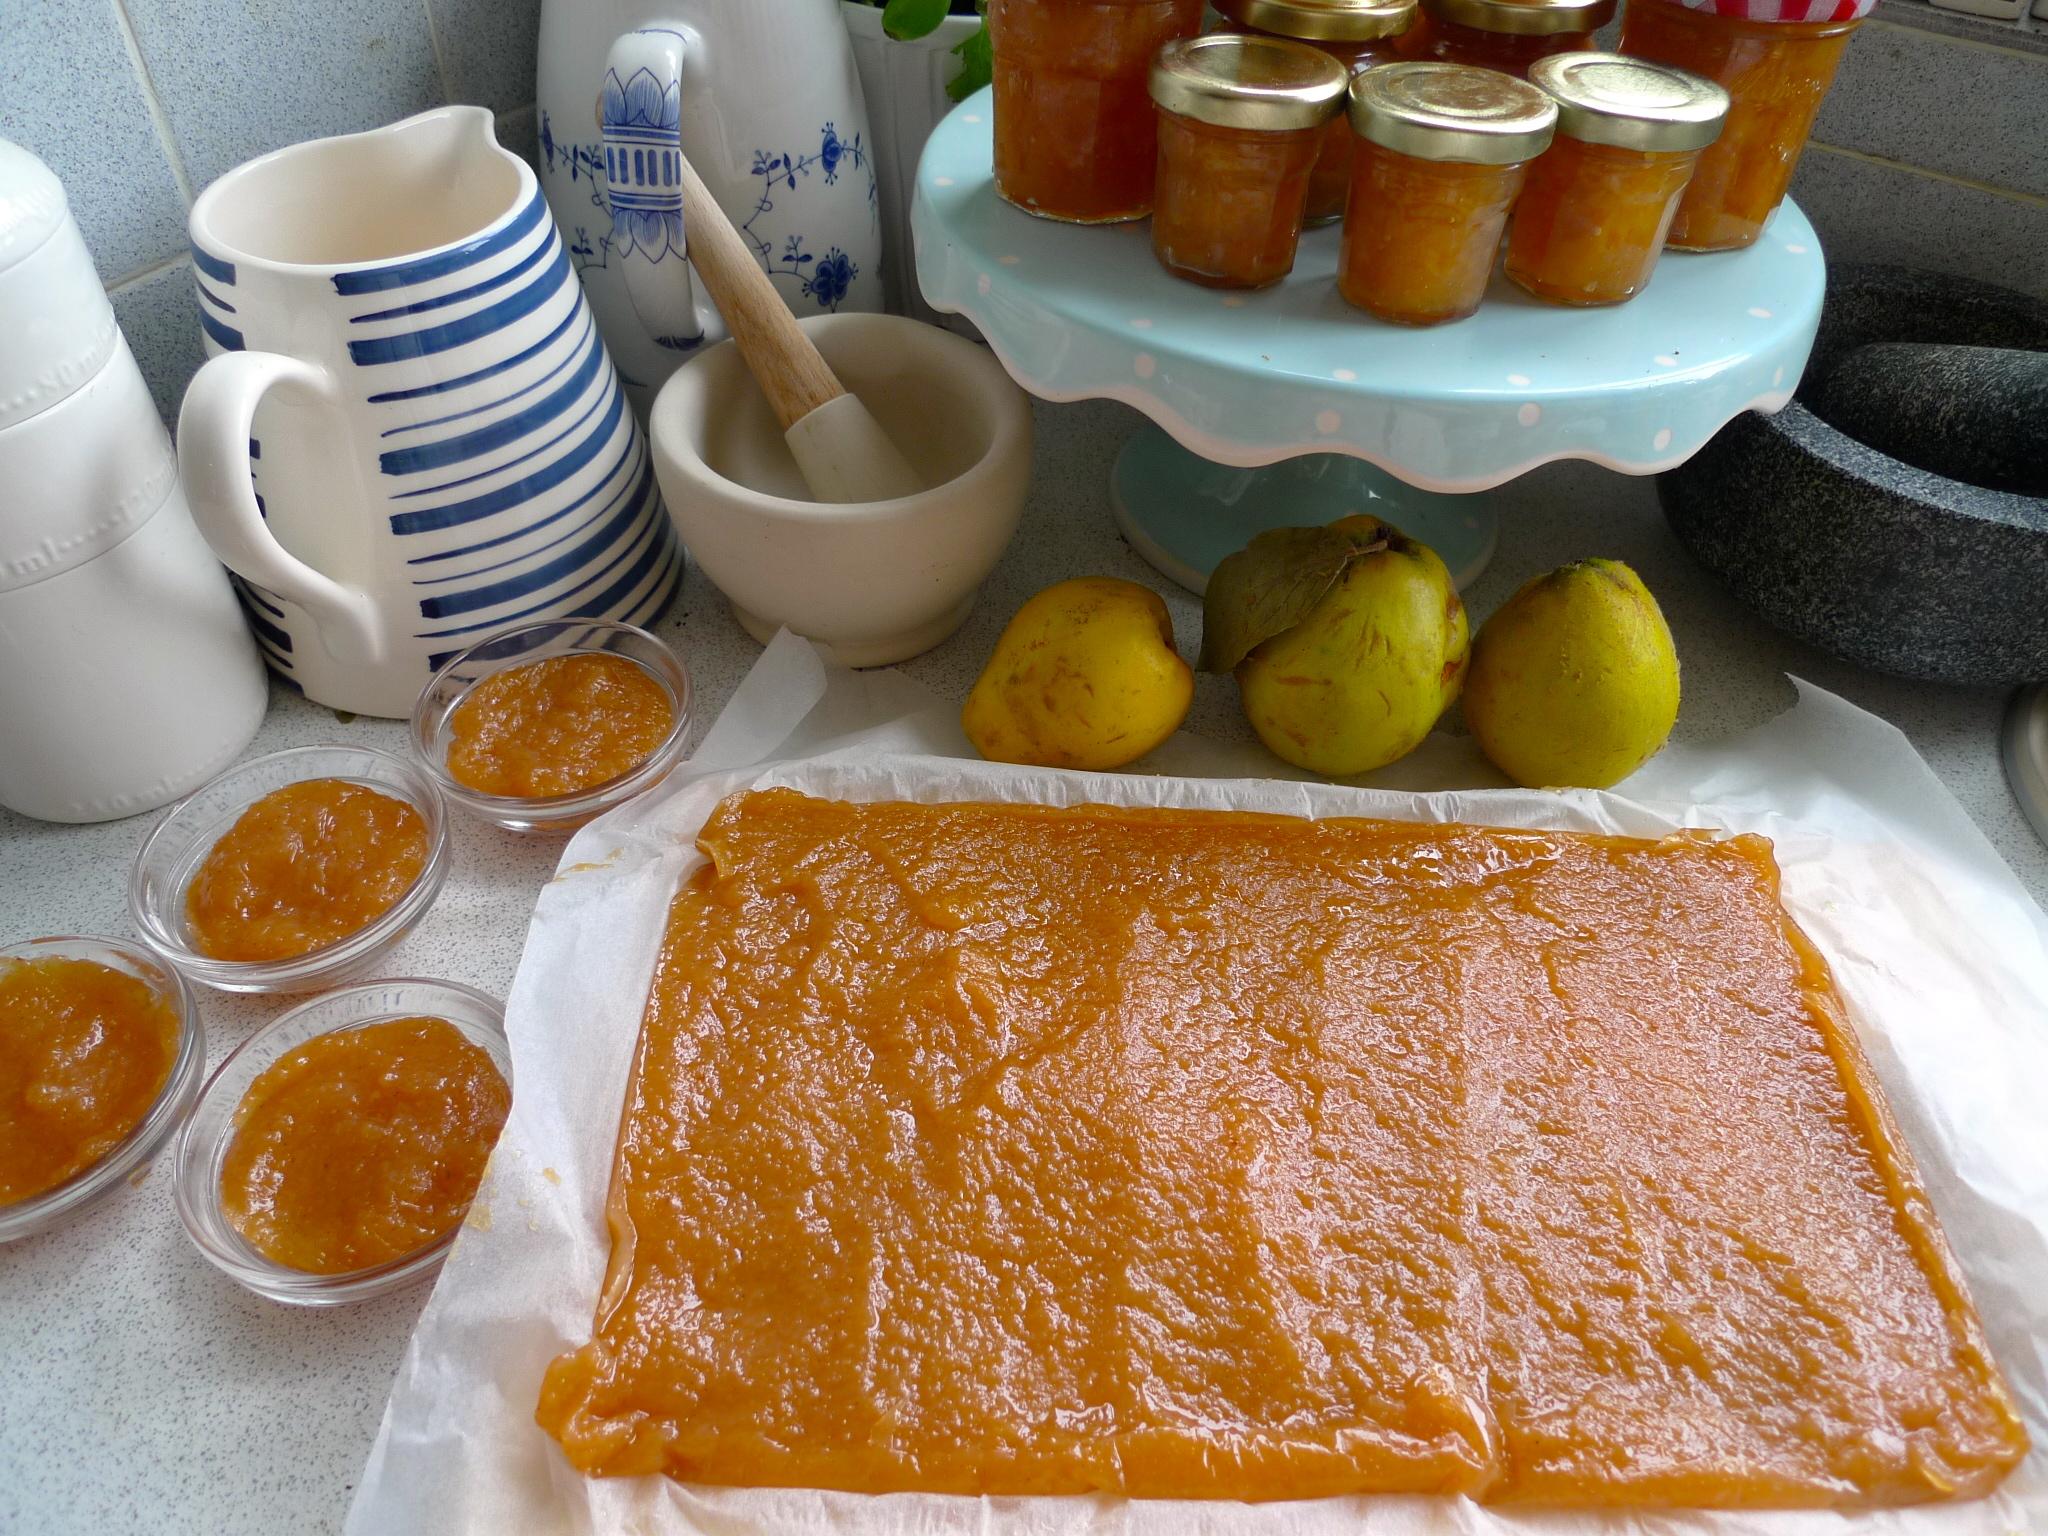 Quince jam and Membrillo